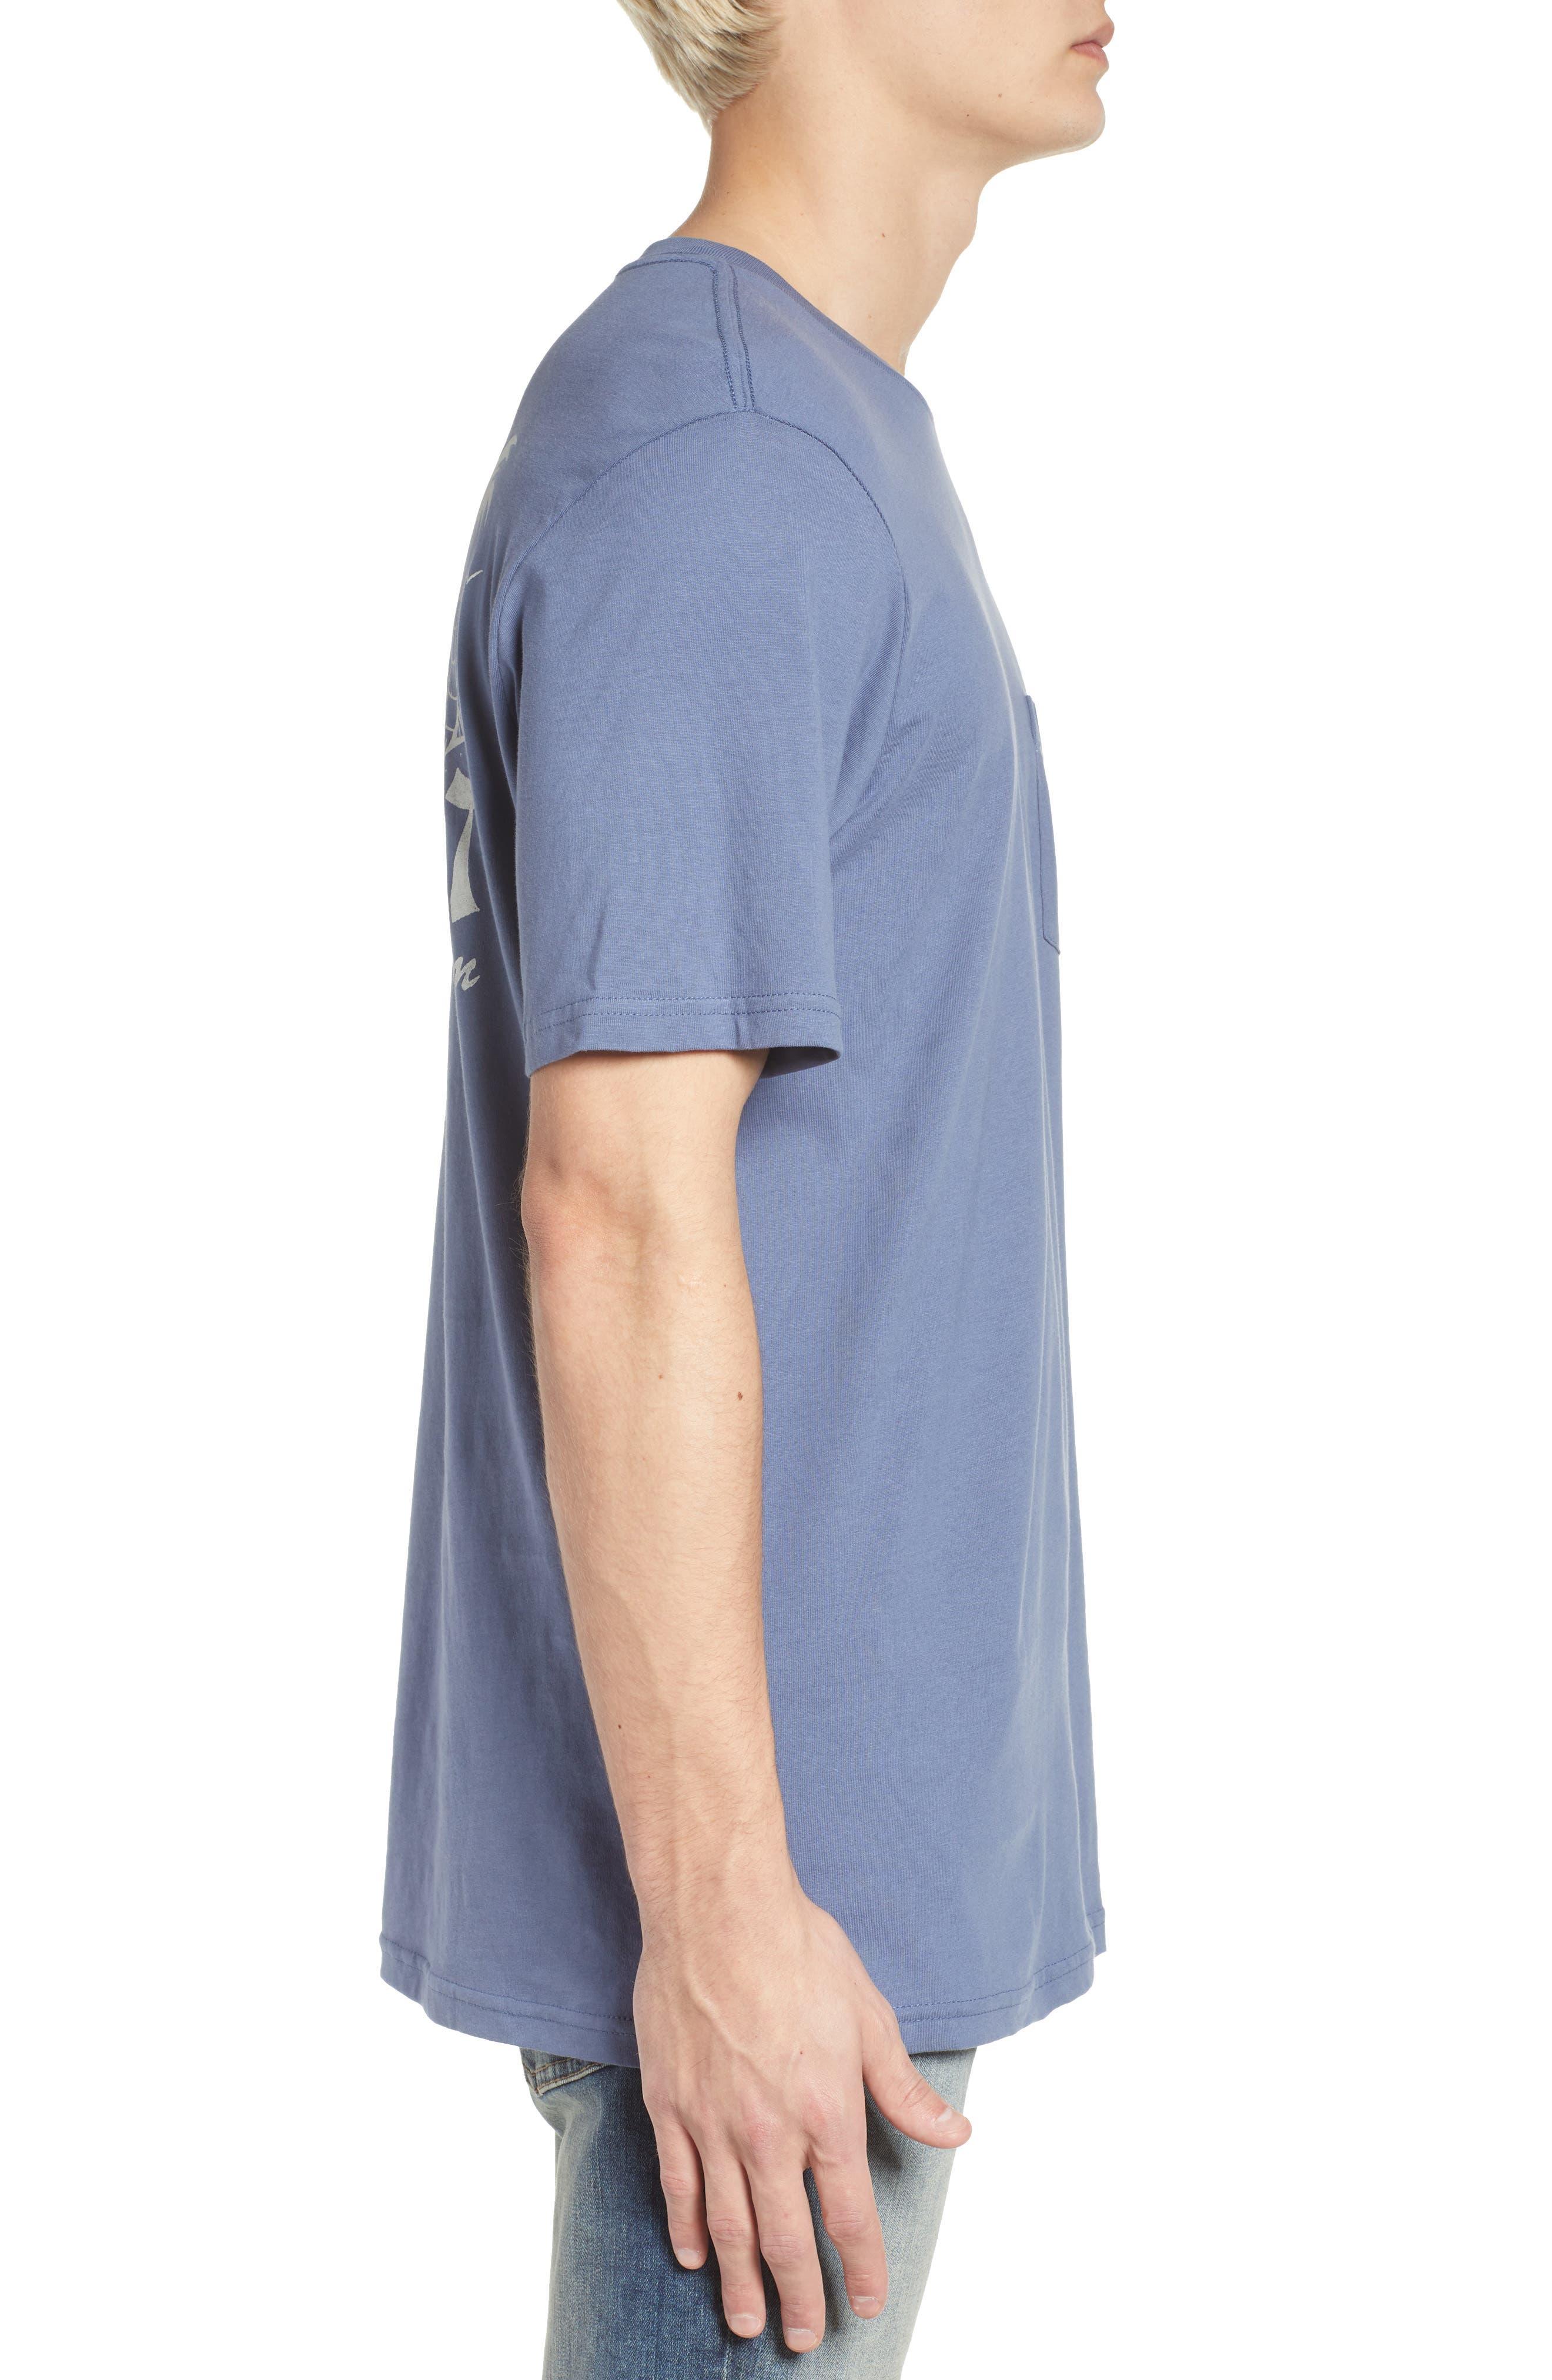 Last Resort Pocket T-Shirt,                             Alternate thumbnail 3, color,                             463